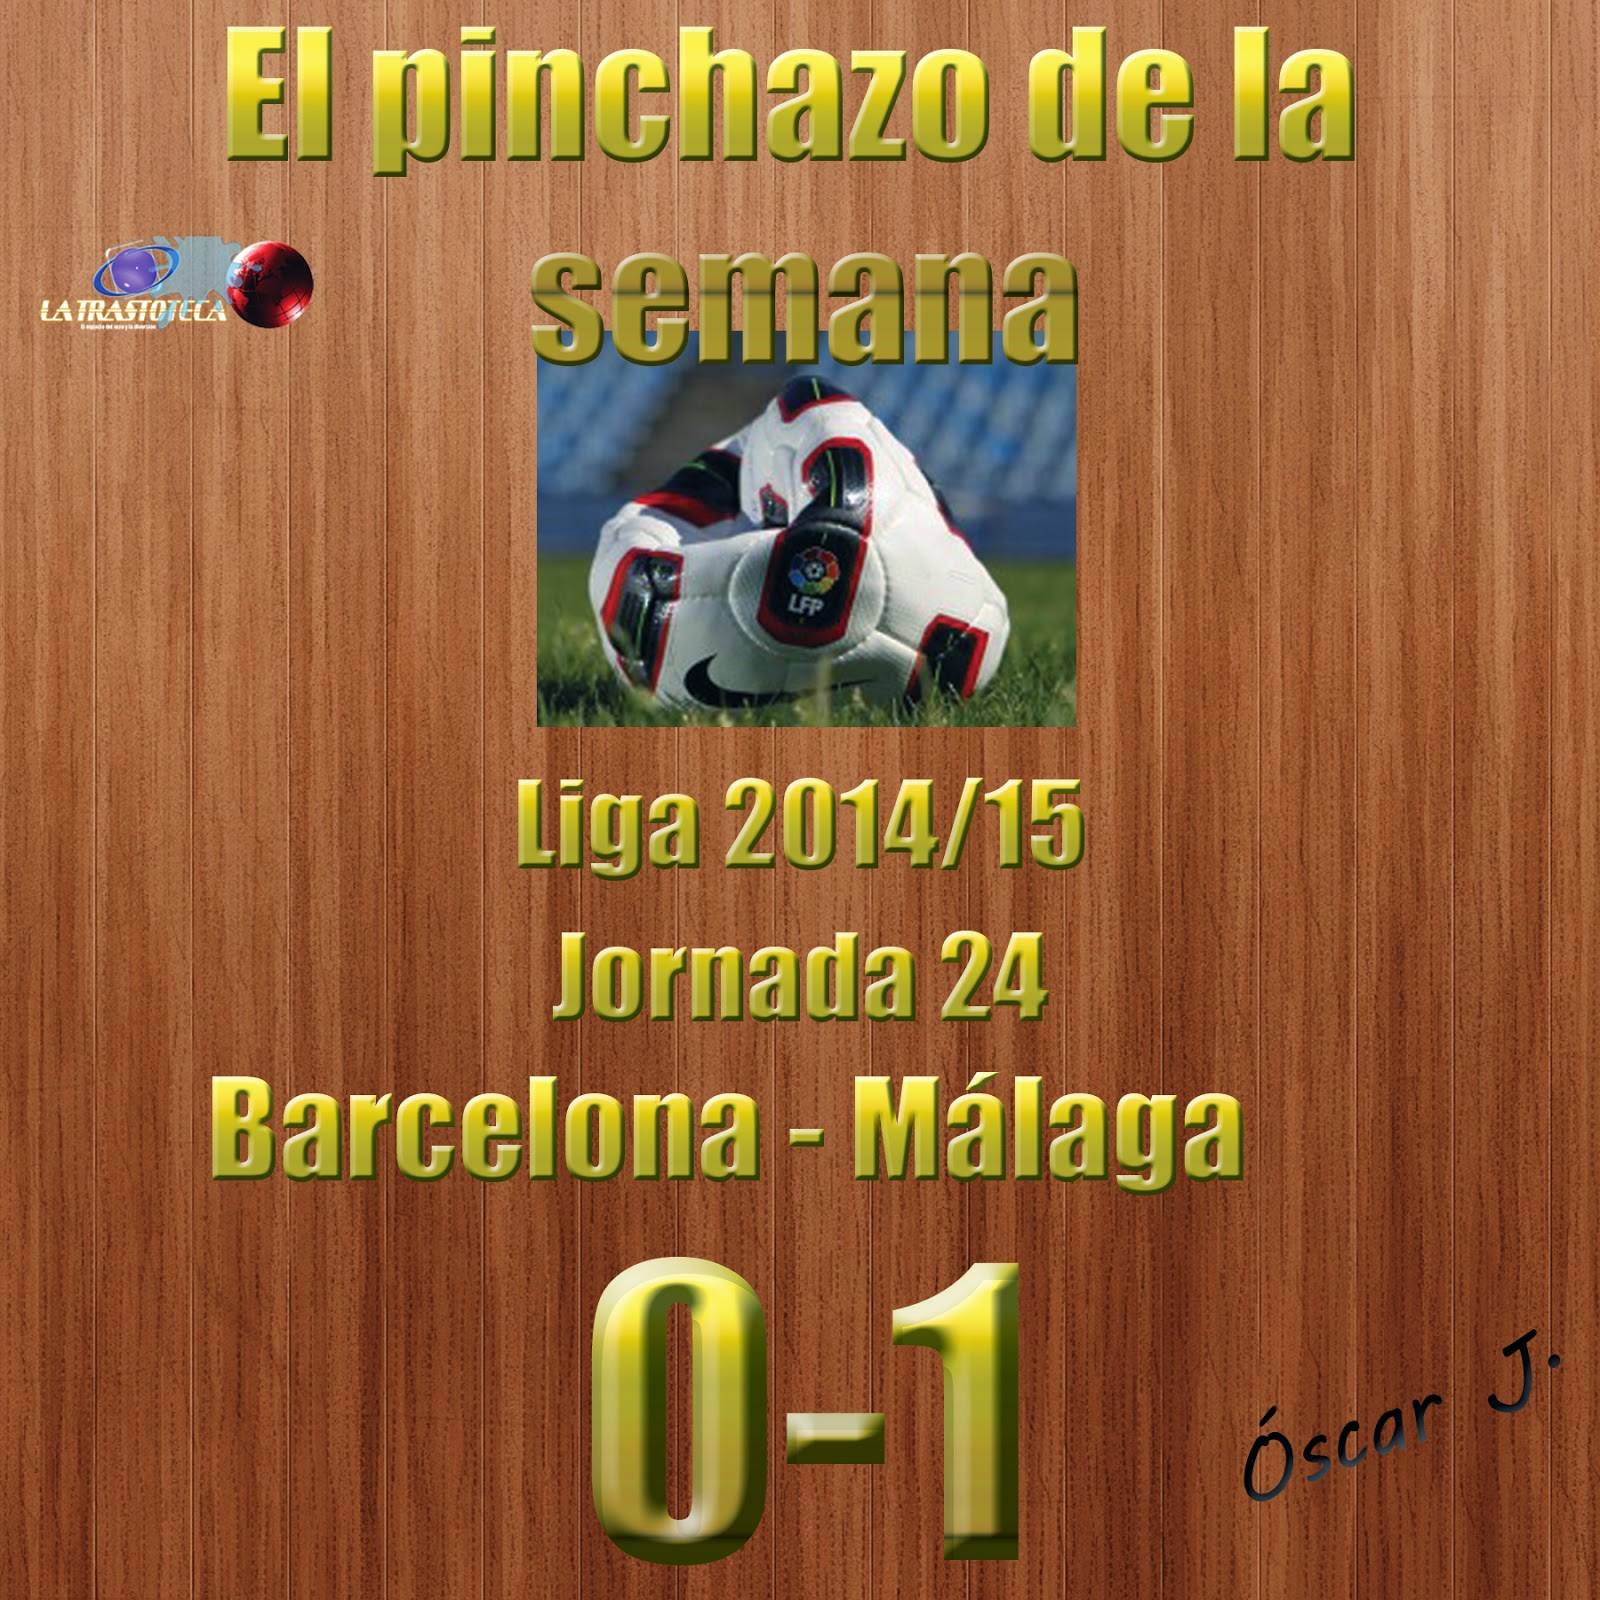 Barcelona 0-1 Málaga. Liga 2014/15 - Jornada 24. El pinchazo de la semana.